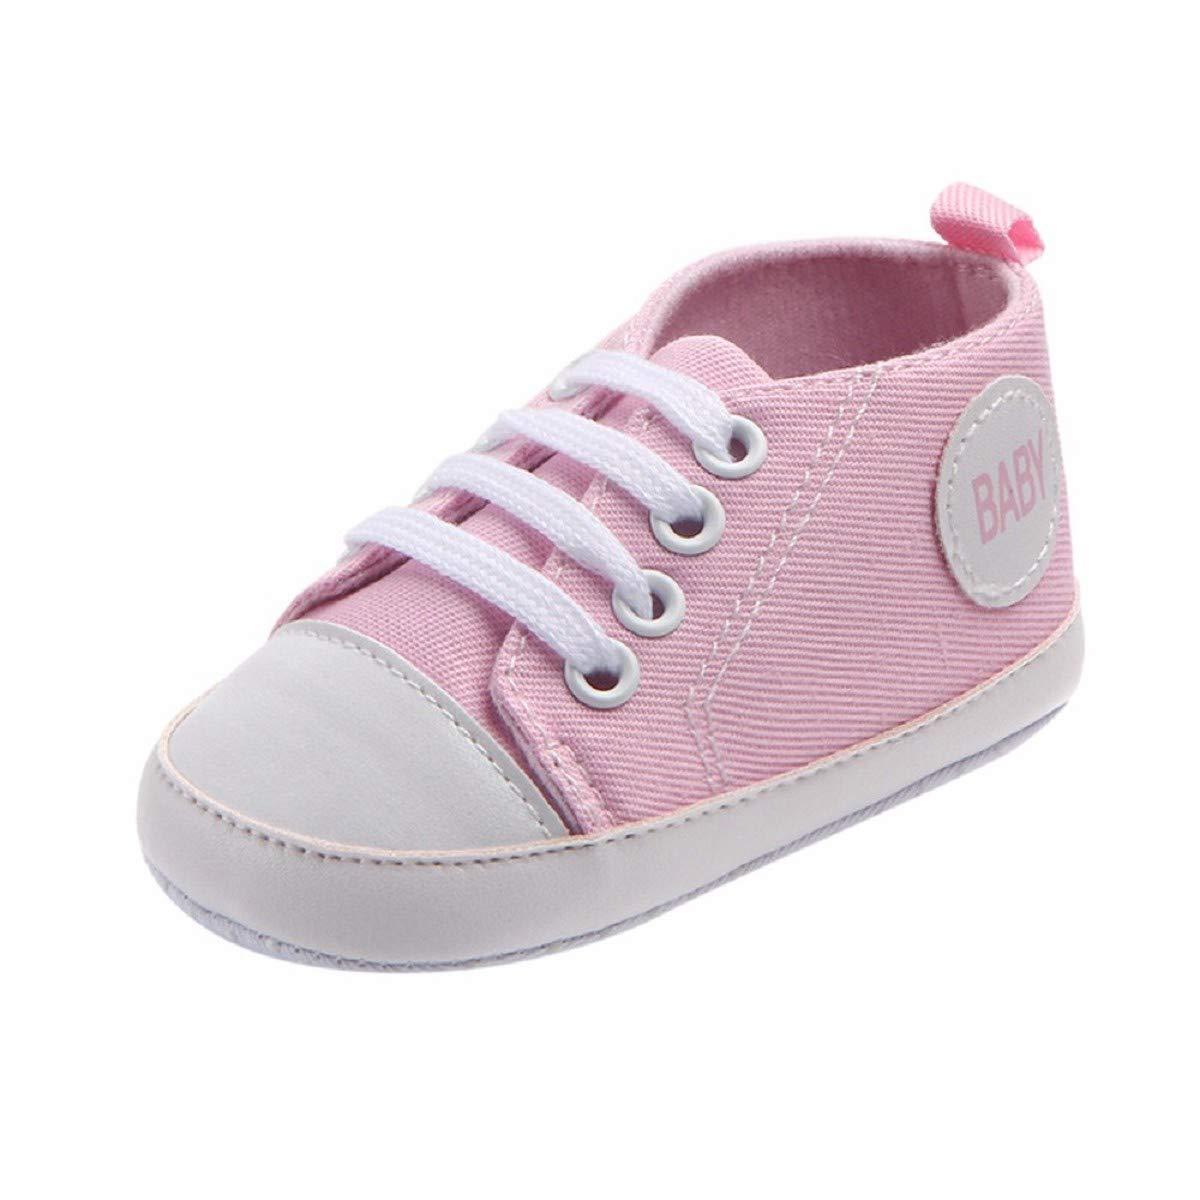 Newborn Canvas Shoes FAPIZI Infant Baby Boys Girls Solid Bandage Anti-Slip Soft Shoes Sneaker Pink